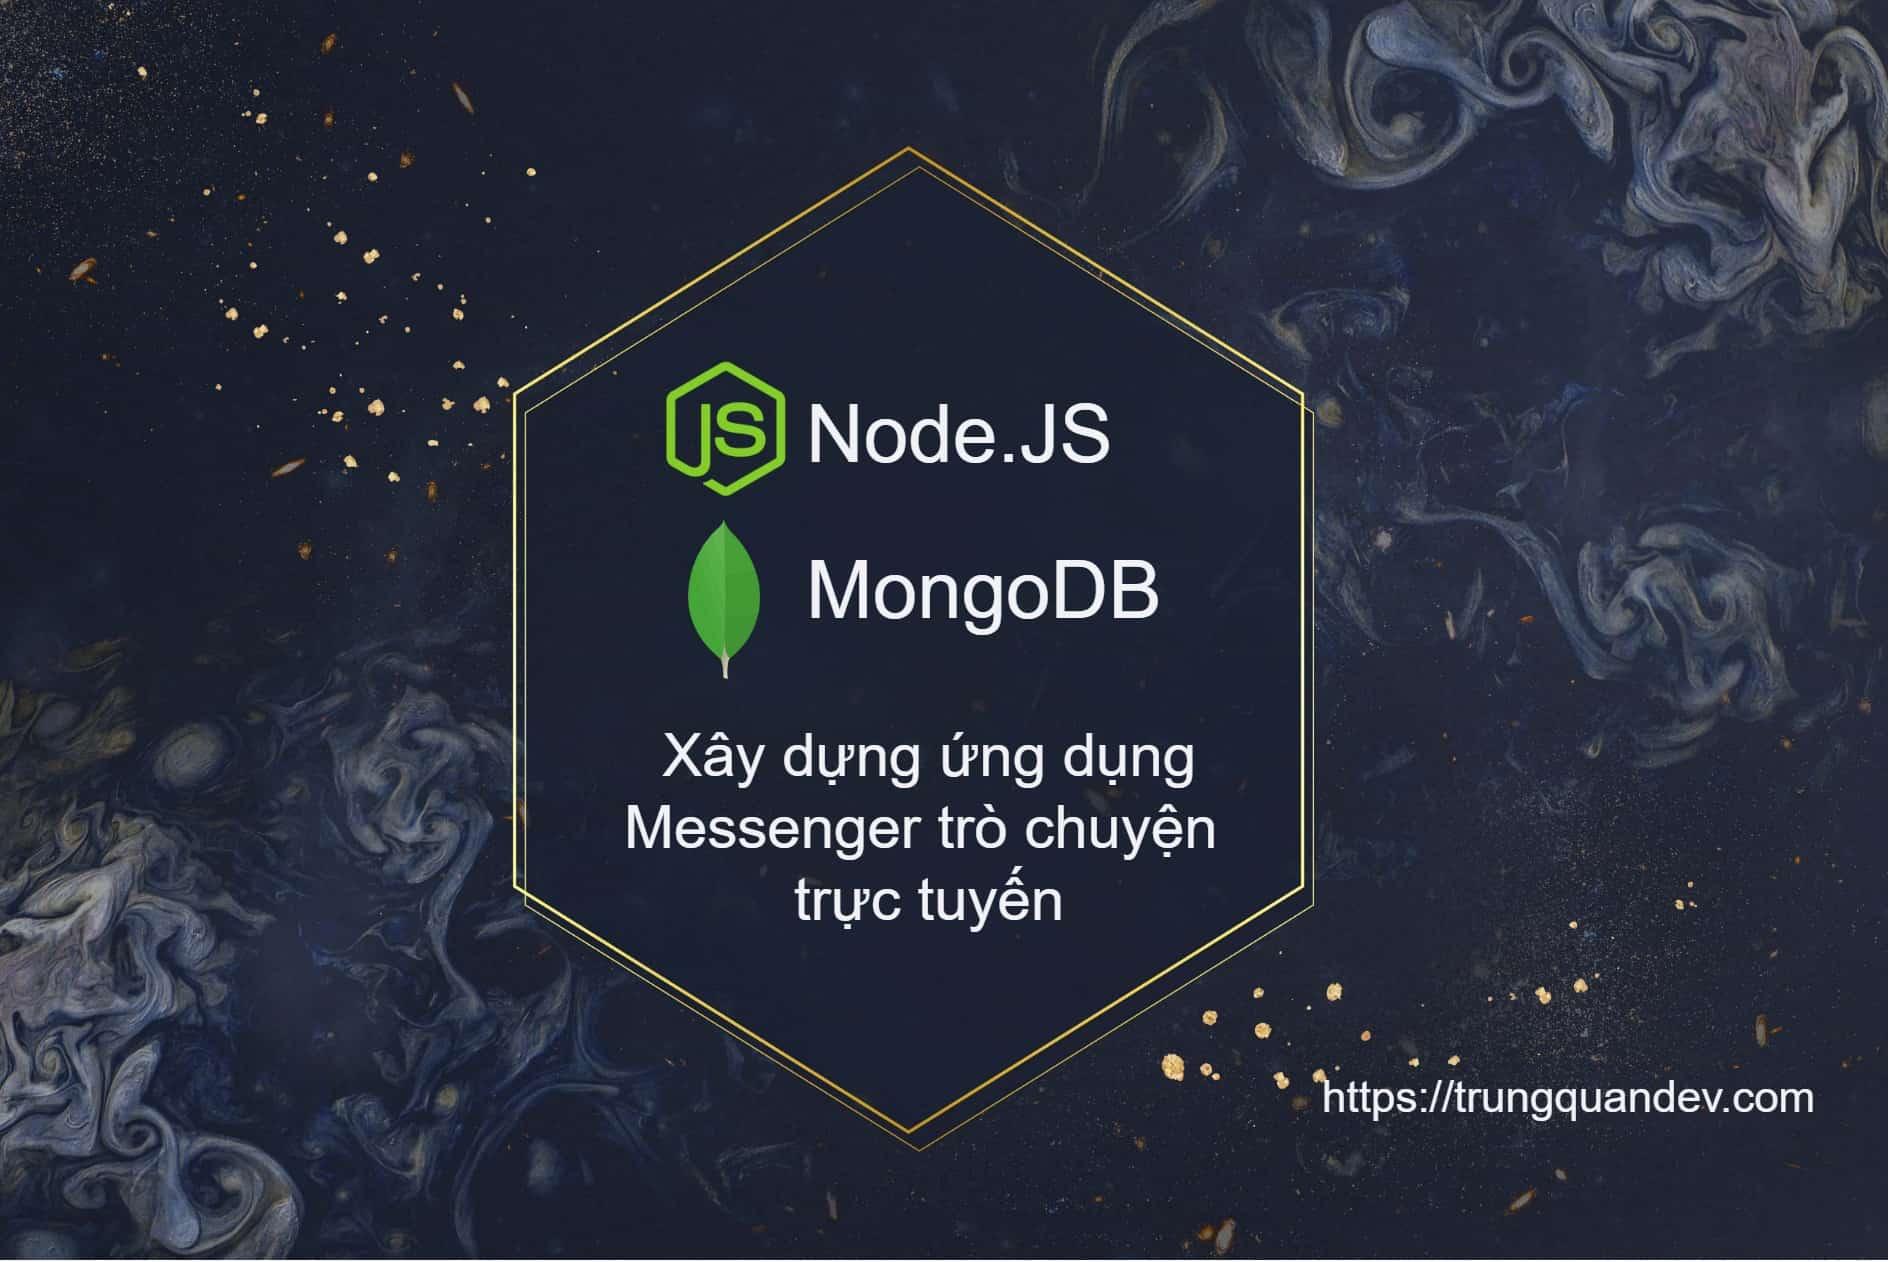 nodejs-mongodb-messenger-realtime-course-trungquandev